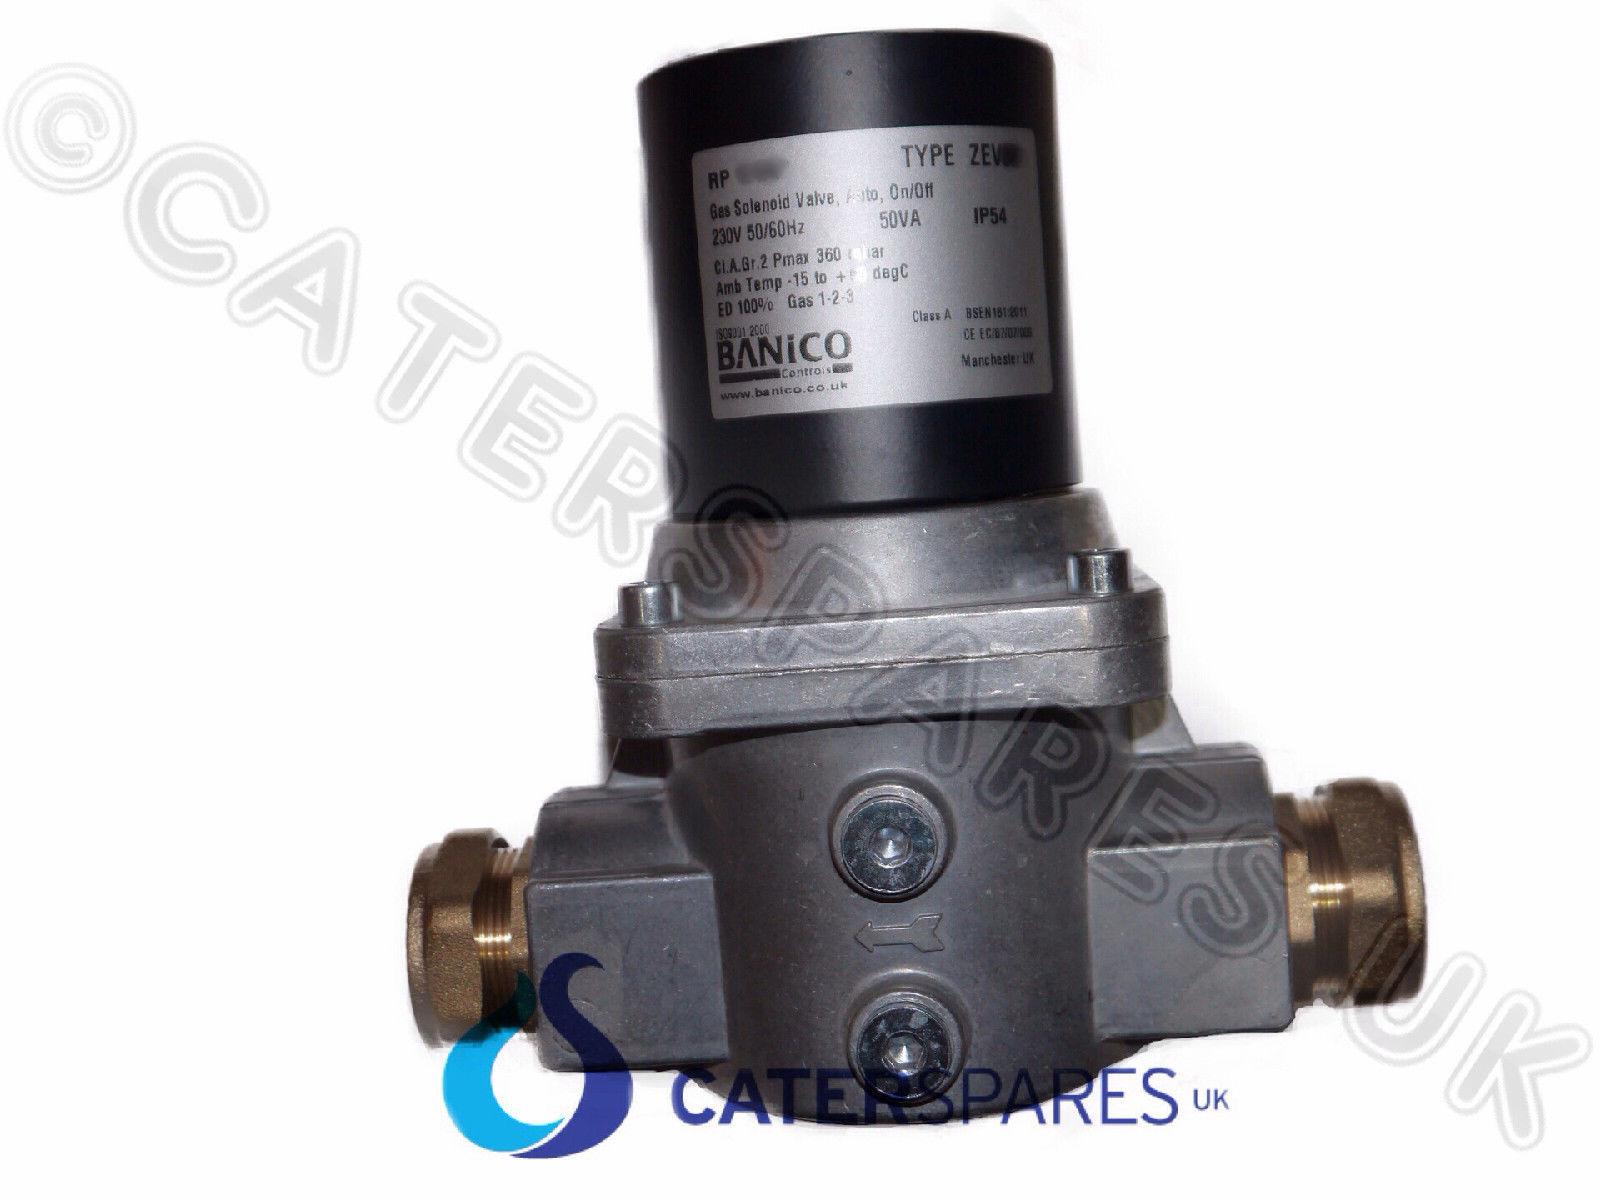 GAS SOLENOID VALVE 35mm COPPER PIPE 4 GAS INTERLOCK VENTILATION ...